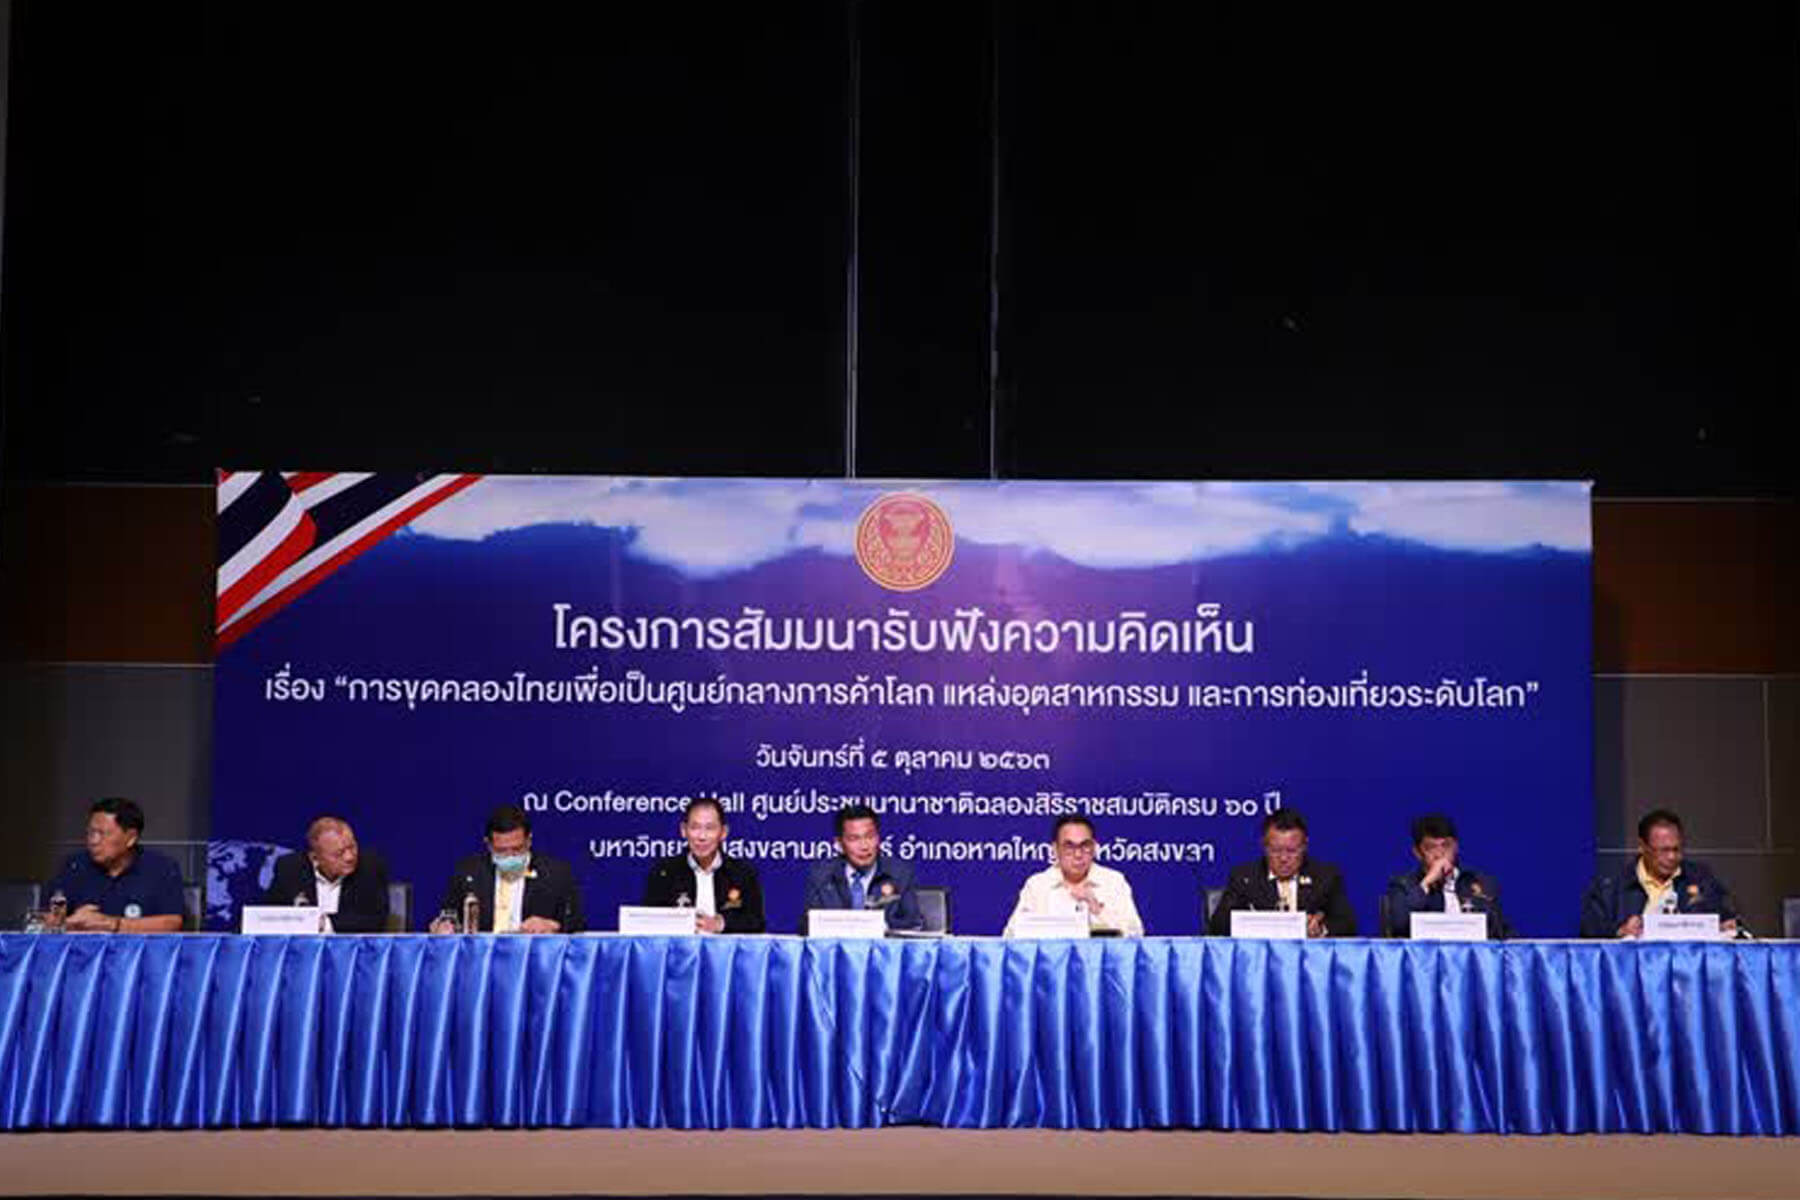 1 ICC HATYAI ศูนย์ประชุมนานาชาติฉลองสิริราชสมบัติครบ ๖๐ ปี